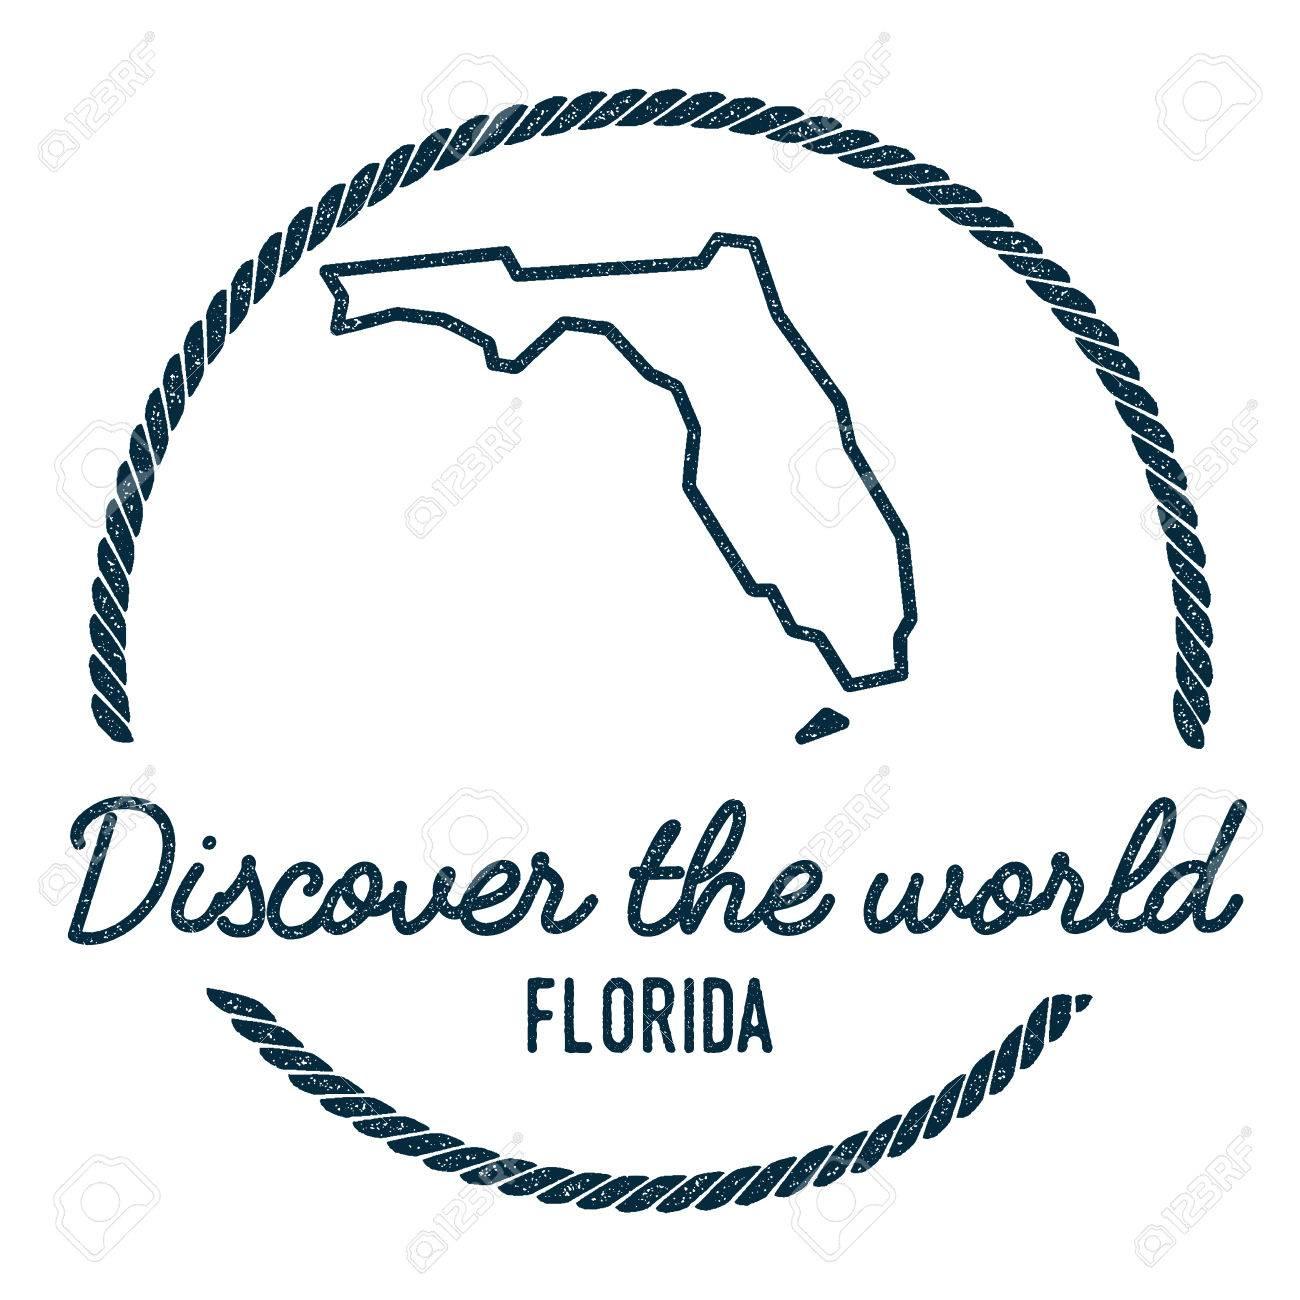 Florida Map Outline.Florida Map Outline Vintage Discover The World Rubber Stamp